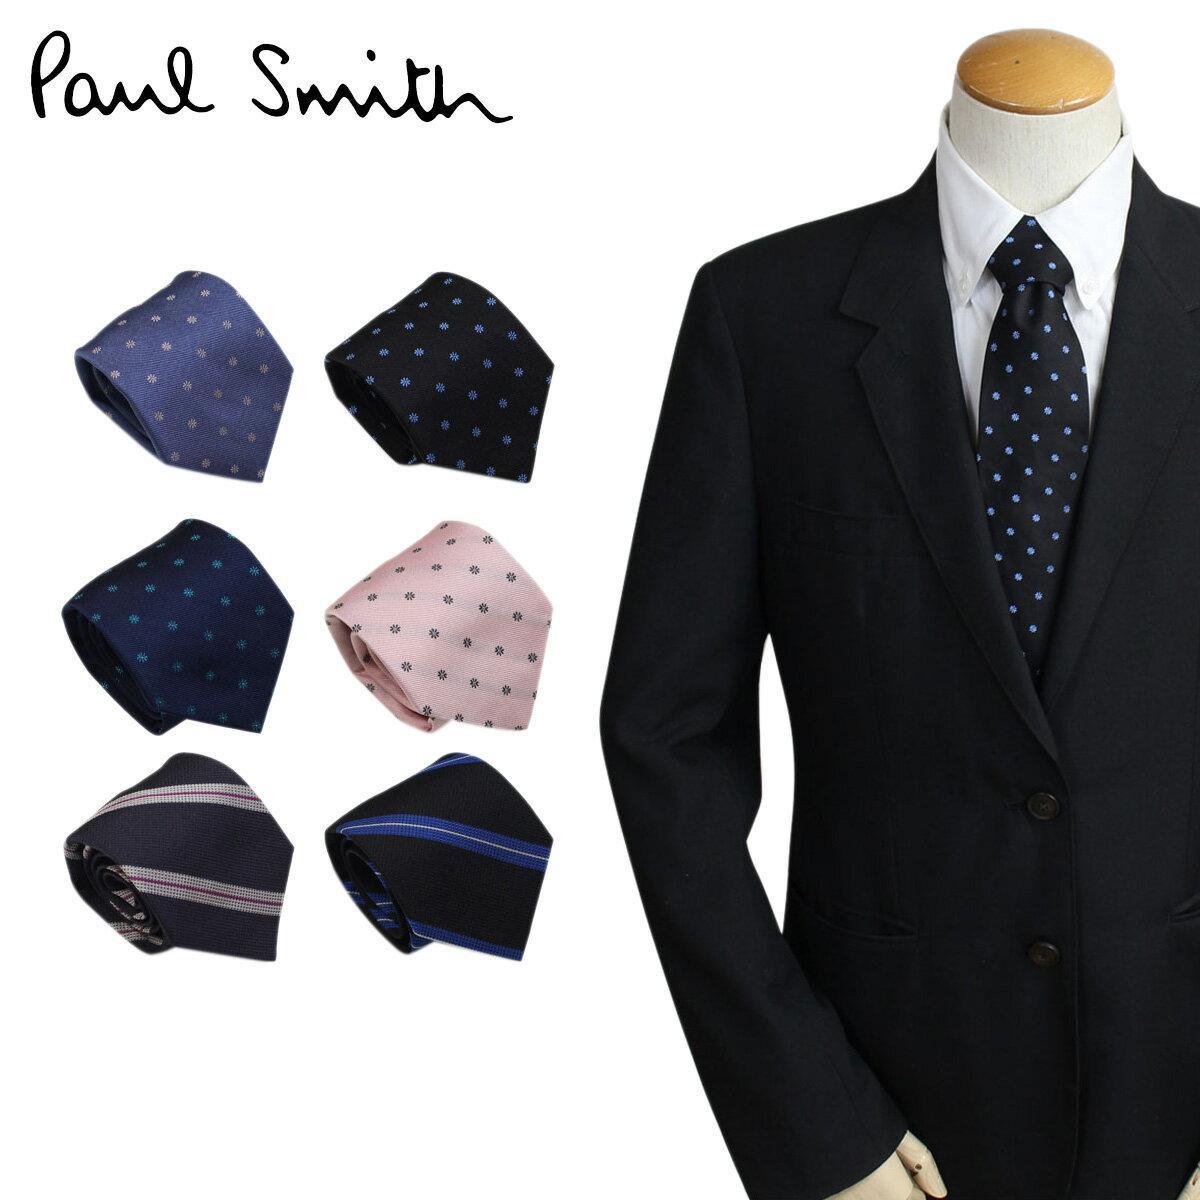 Paul Smith ネクタイ シルク メンズ ポールスミス ストライプ ギフト ケース付 イタリア製 ビジネス 結婚式 [8/7 追加入荷] [188] 【決算セール】